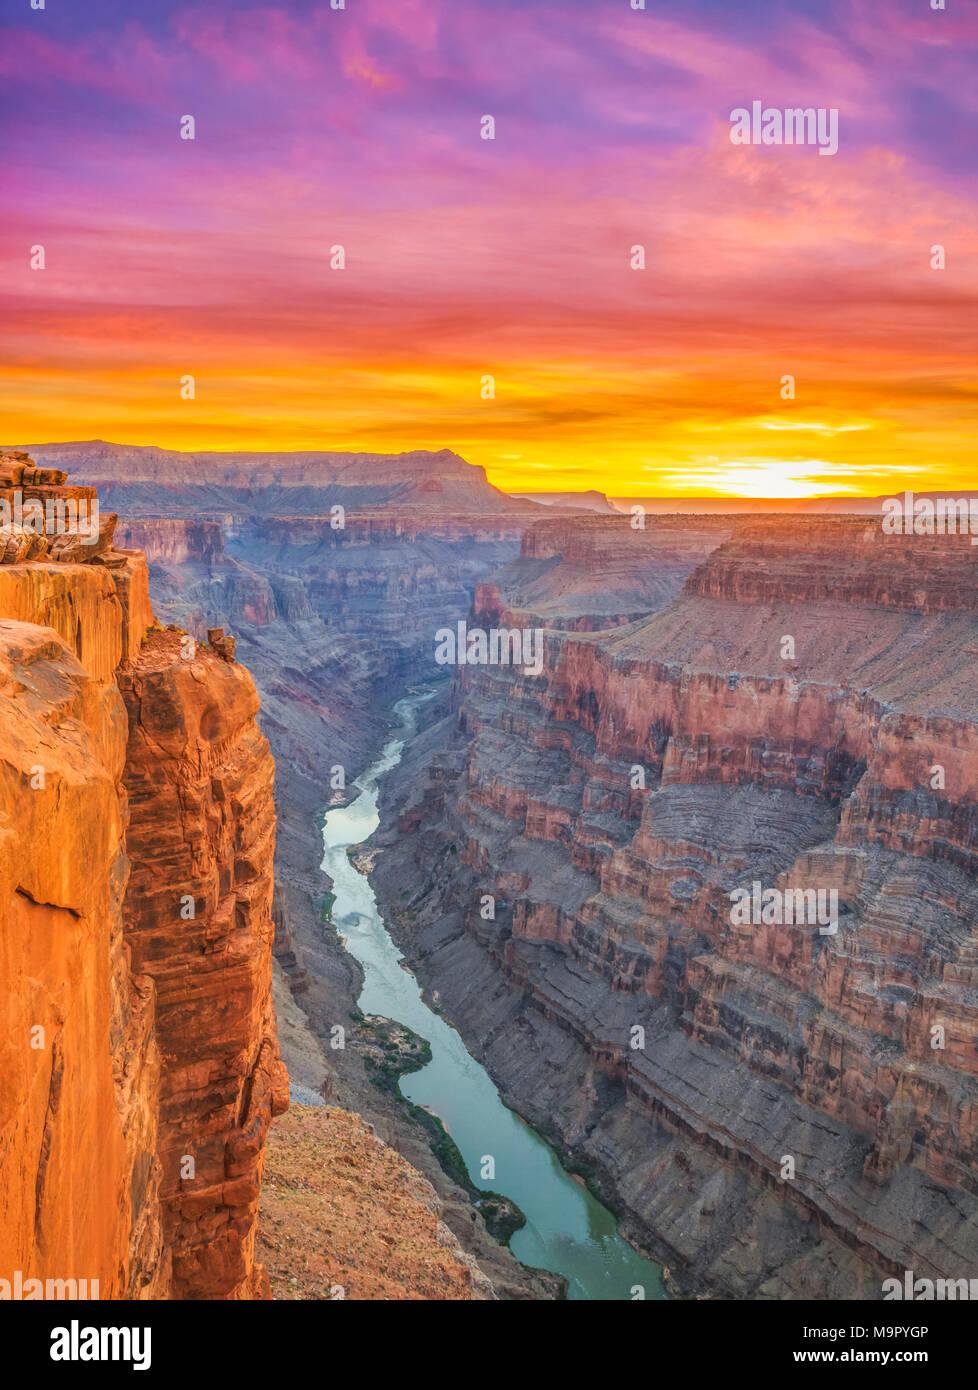 Sonnenaufgang über dem Colorado River im Toroweap Overlook im Grand Canyon National Park, arizona Stockbild